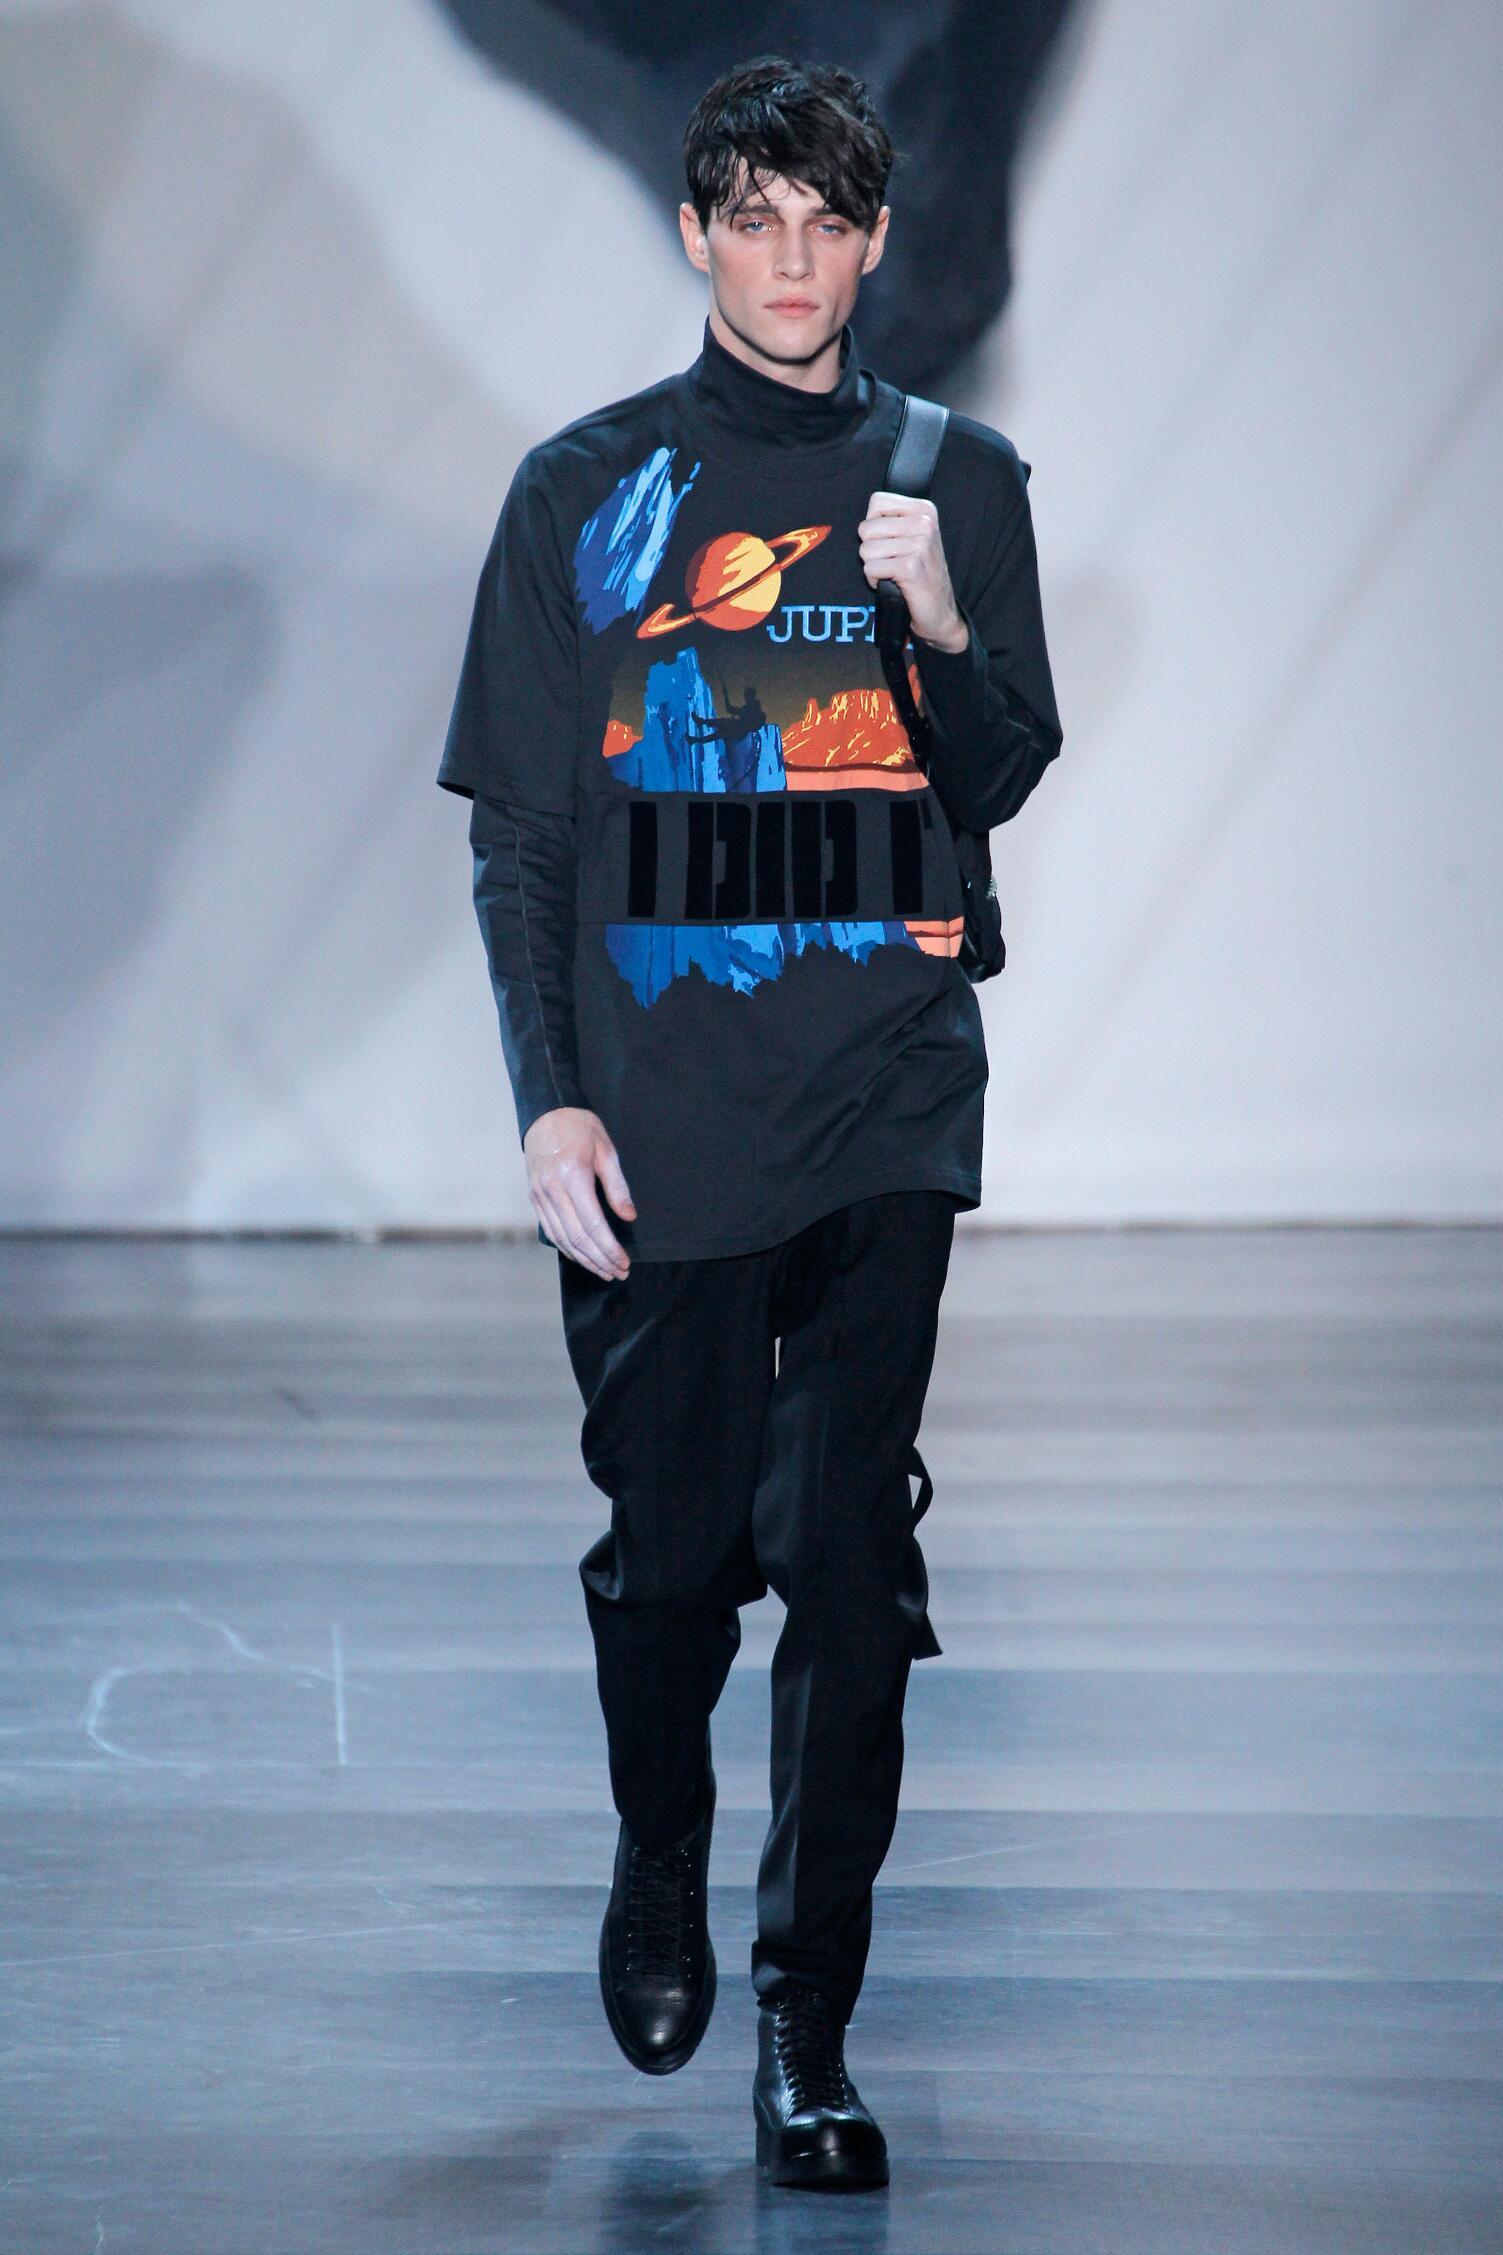 Phillip Lim Fall Winter 2015 16 Men's Collection Paris Fashion Week Fashion Show